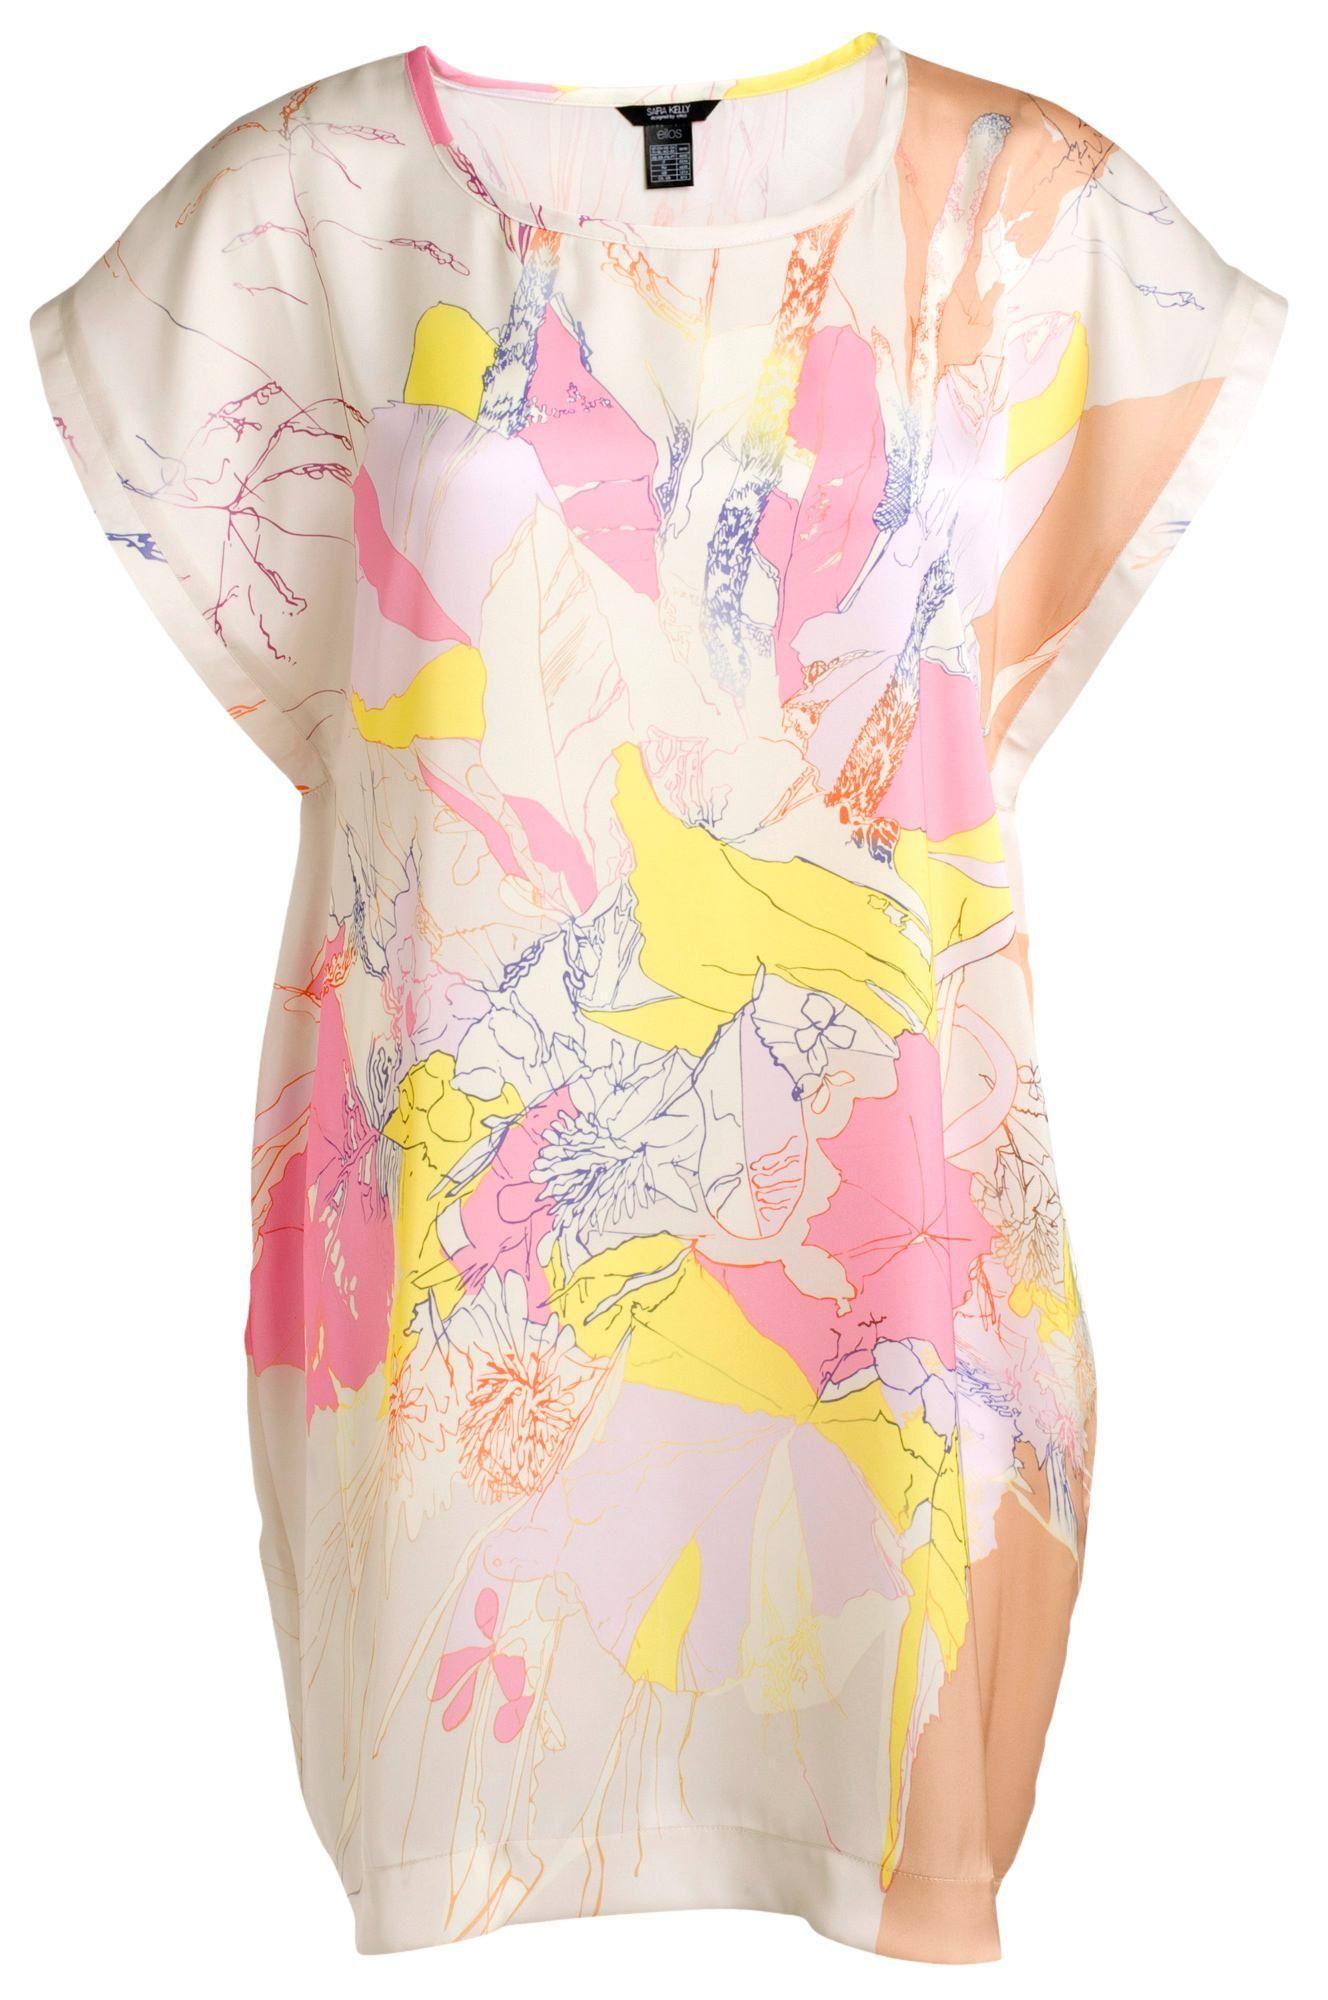 Sara Kelly Nowa Sukienka Mini Oversize 38 40 M L 7382399837 Oficjalne Archiwum Allegro Moda Boho Vintage Boho Flower Dresses